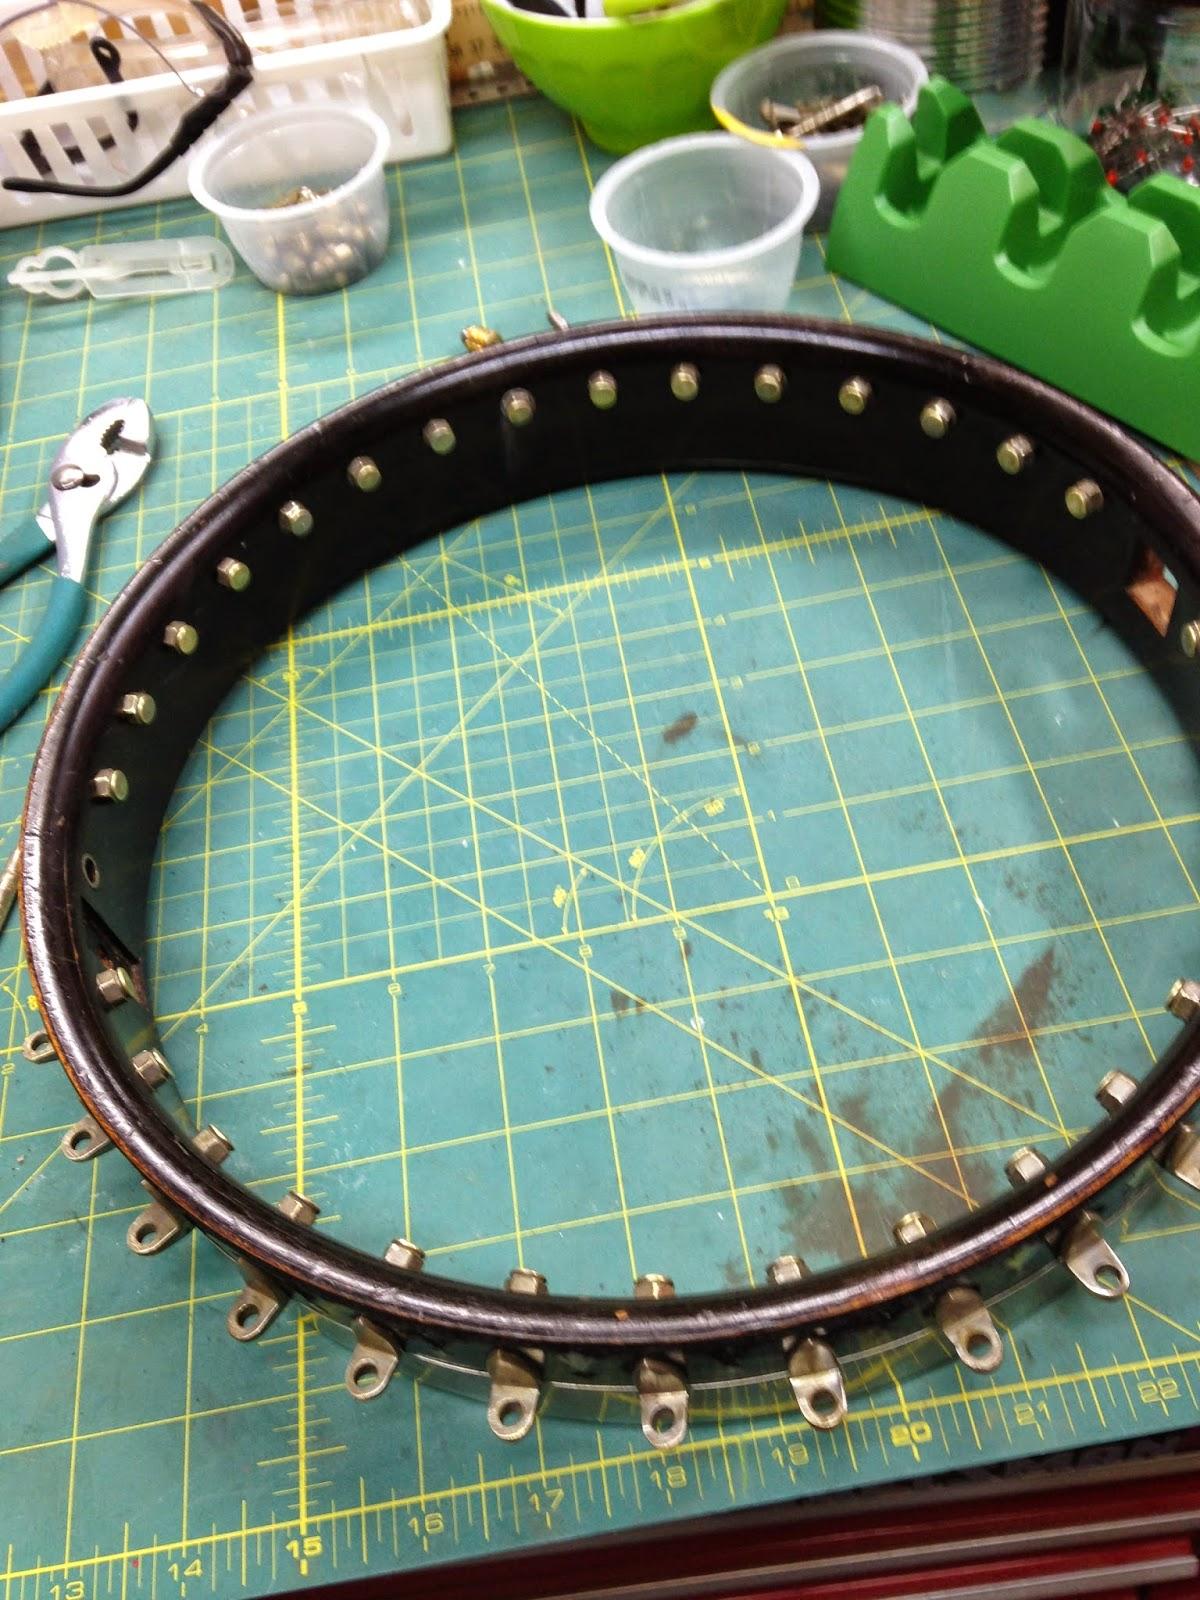 Little Bear Banjo Blog: Repairing an Old Cole Banjo